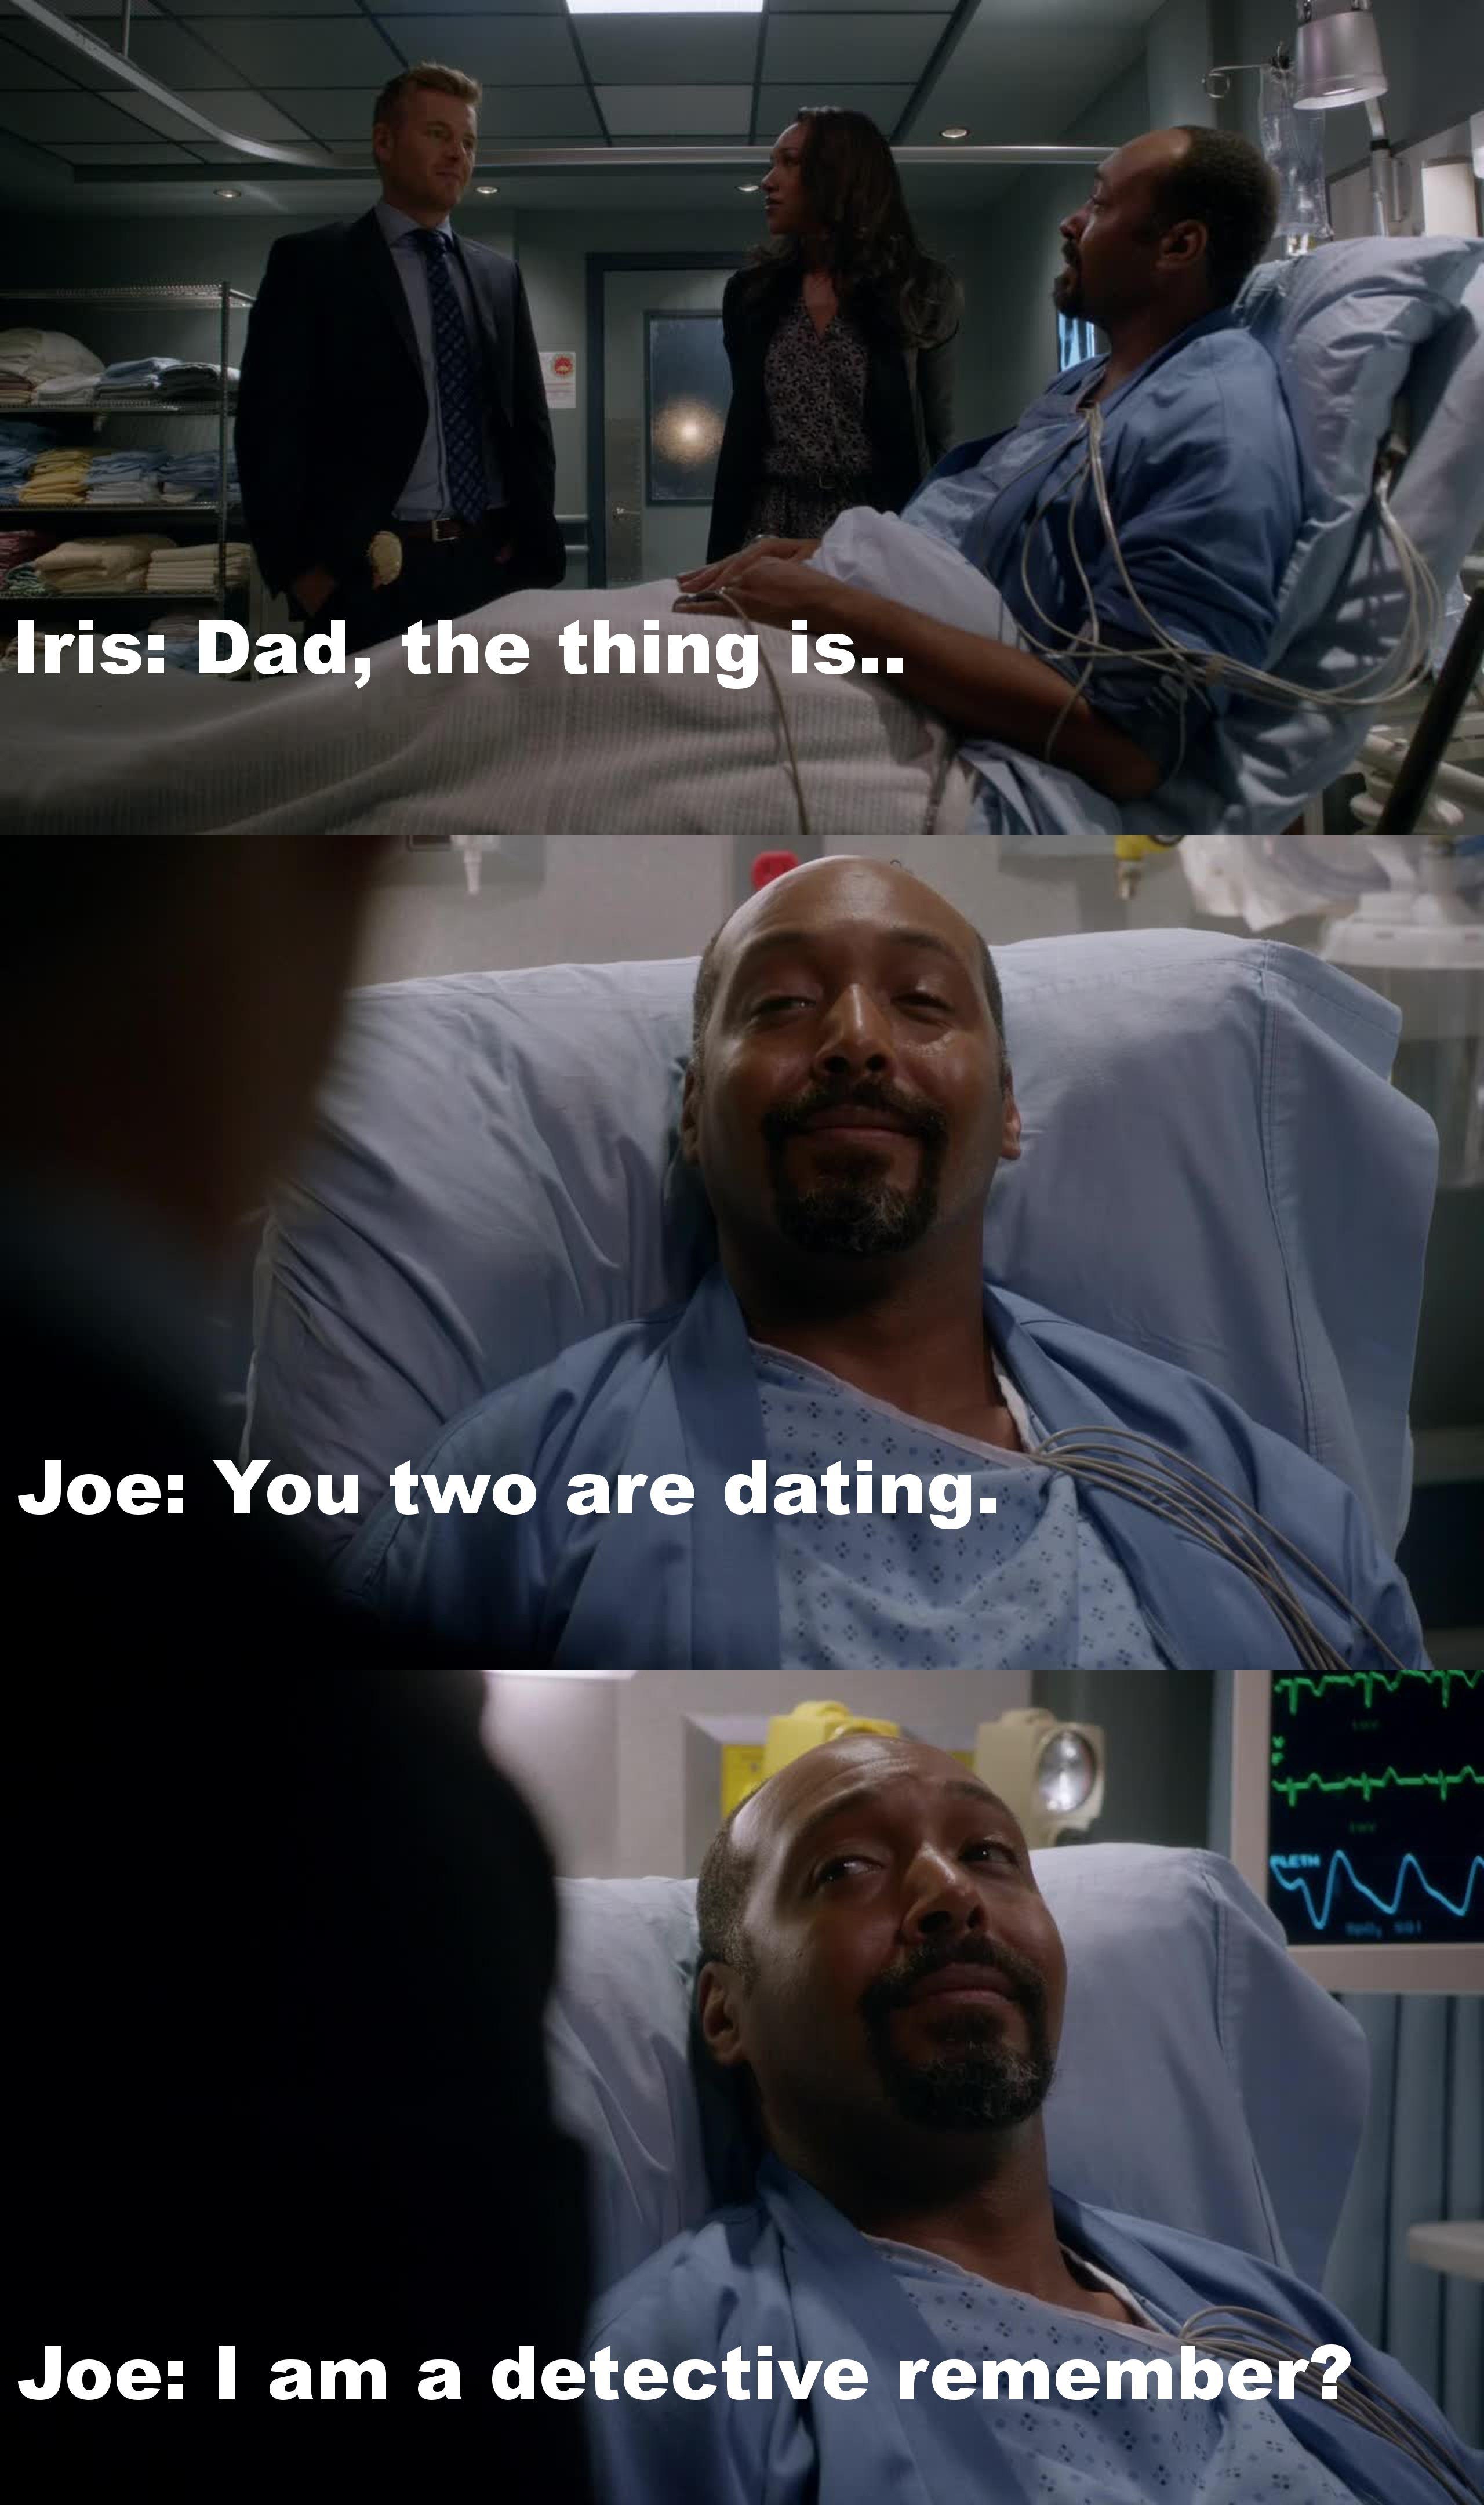 HAAHAHAHAHA, Joe is awesome